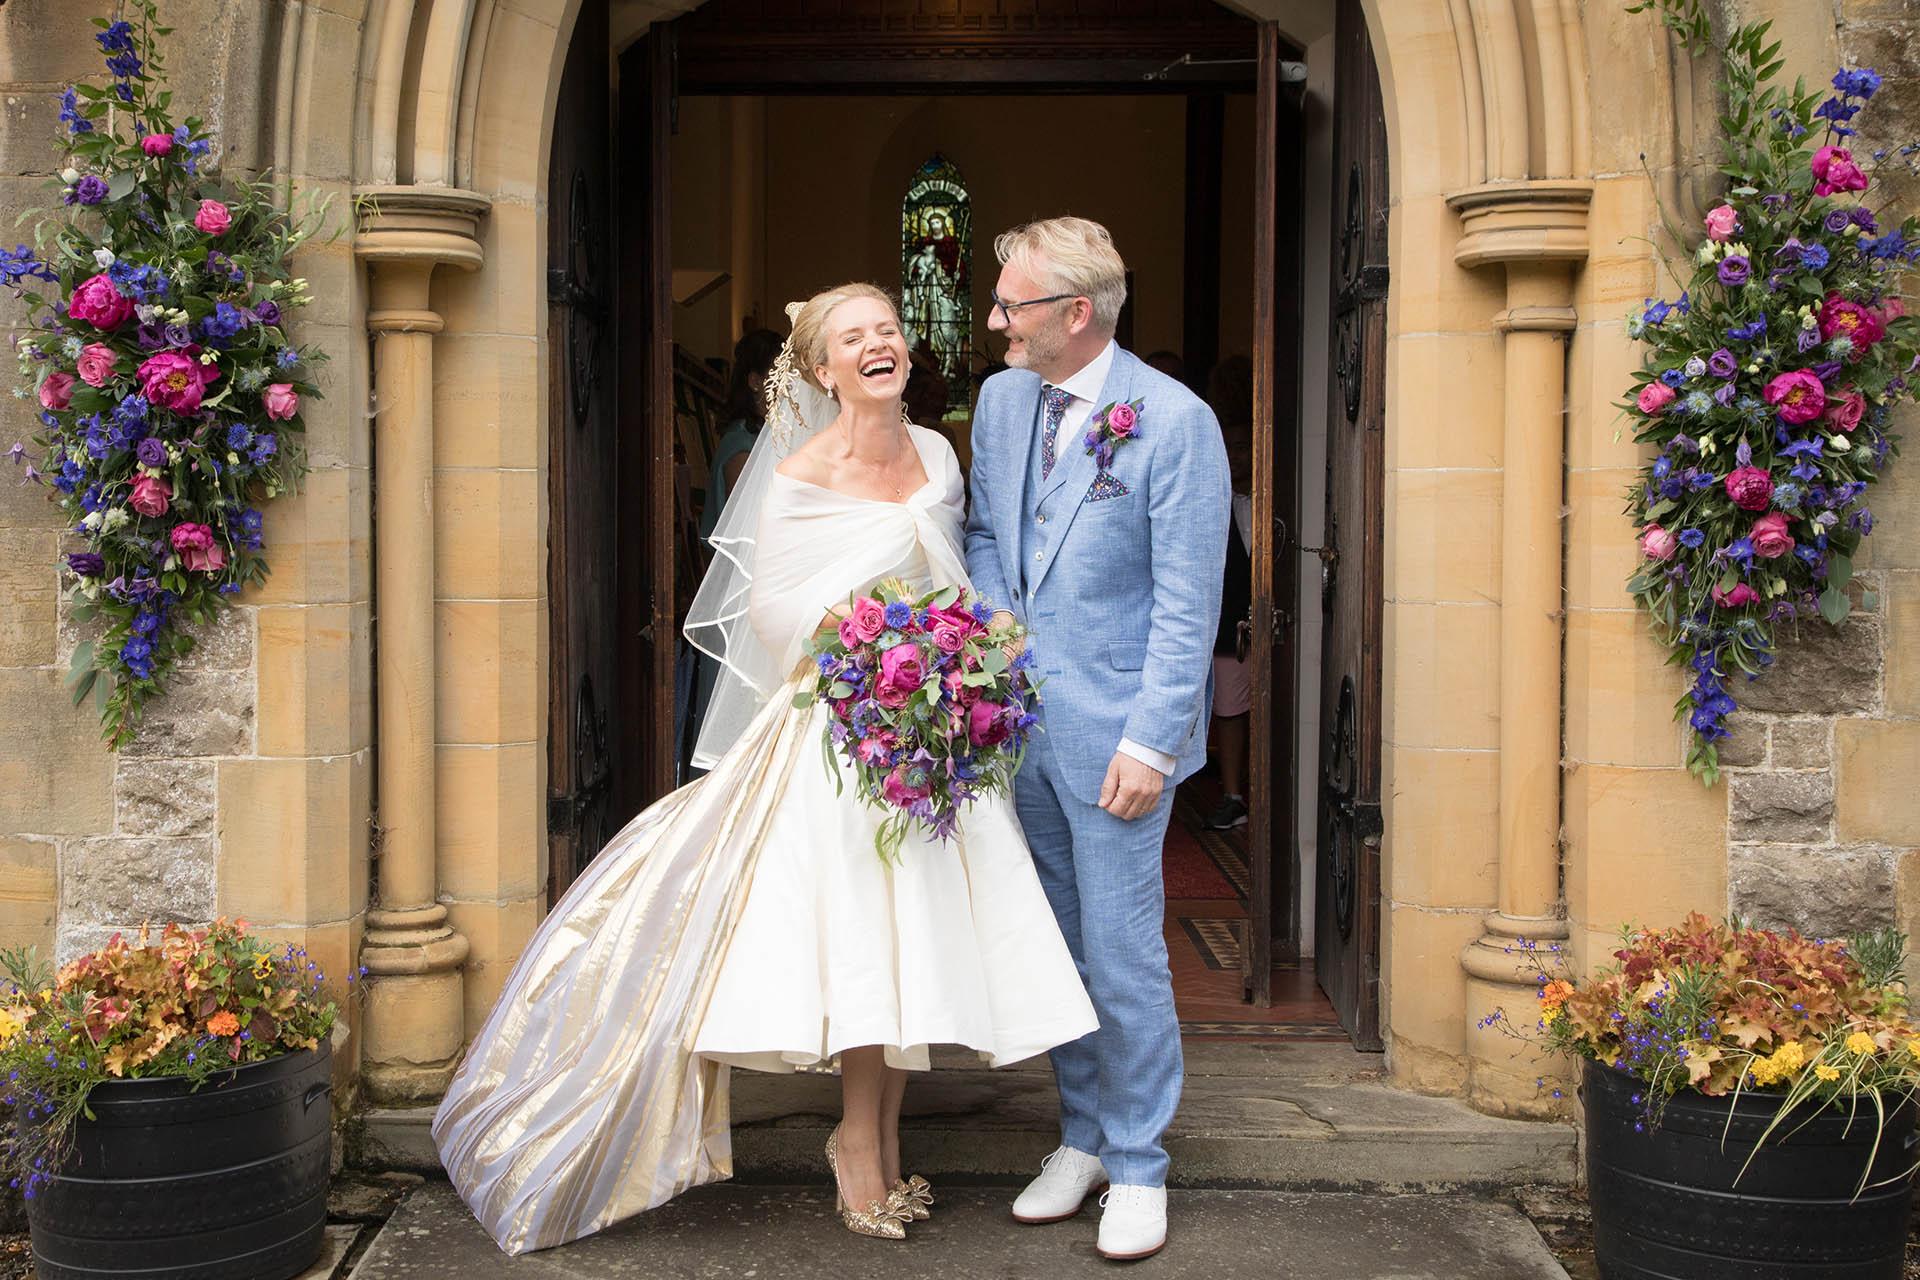 Wedding photograph outside church